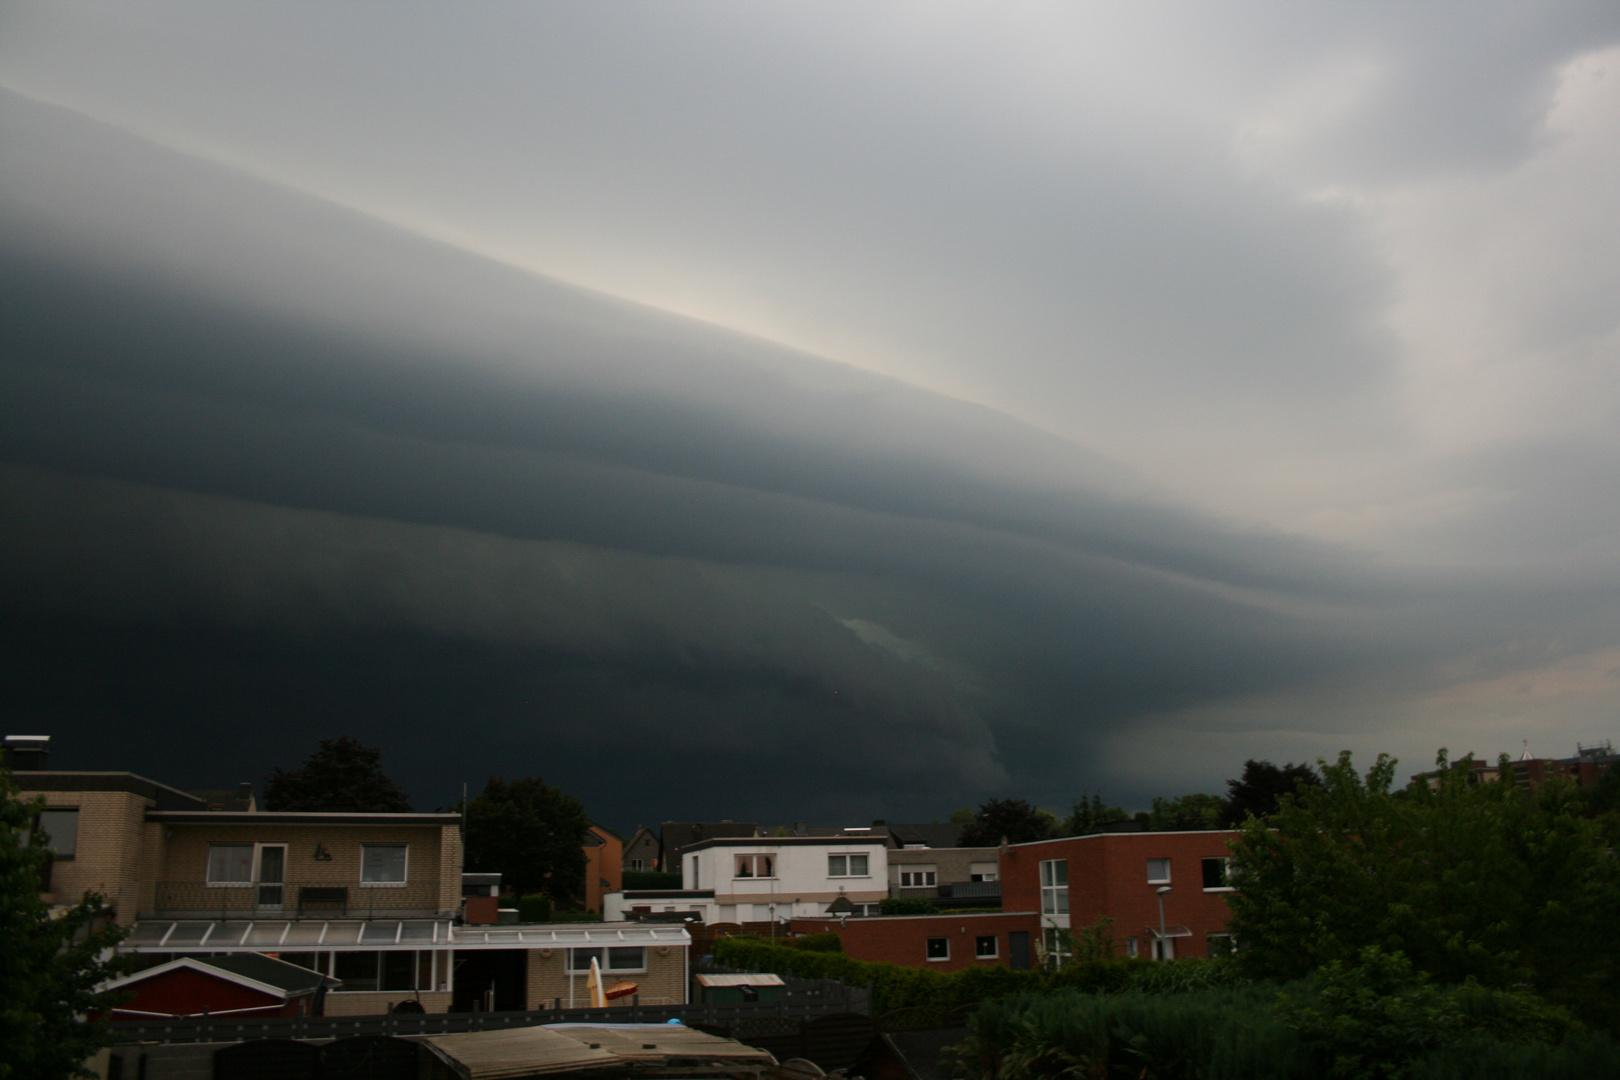 Megacyclone am 09.06.2014 in Bedburg